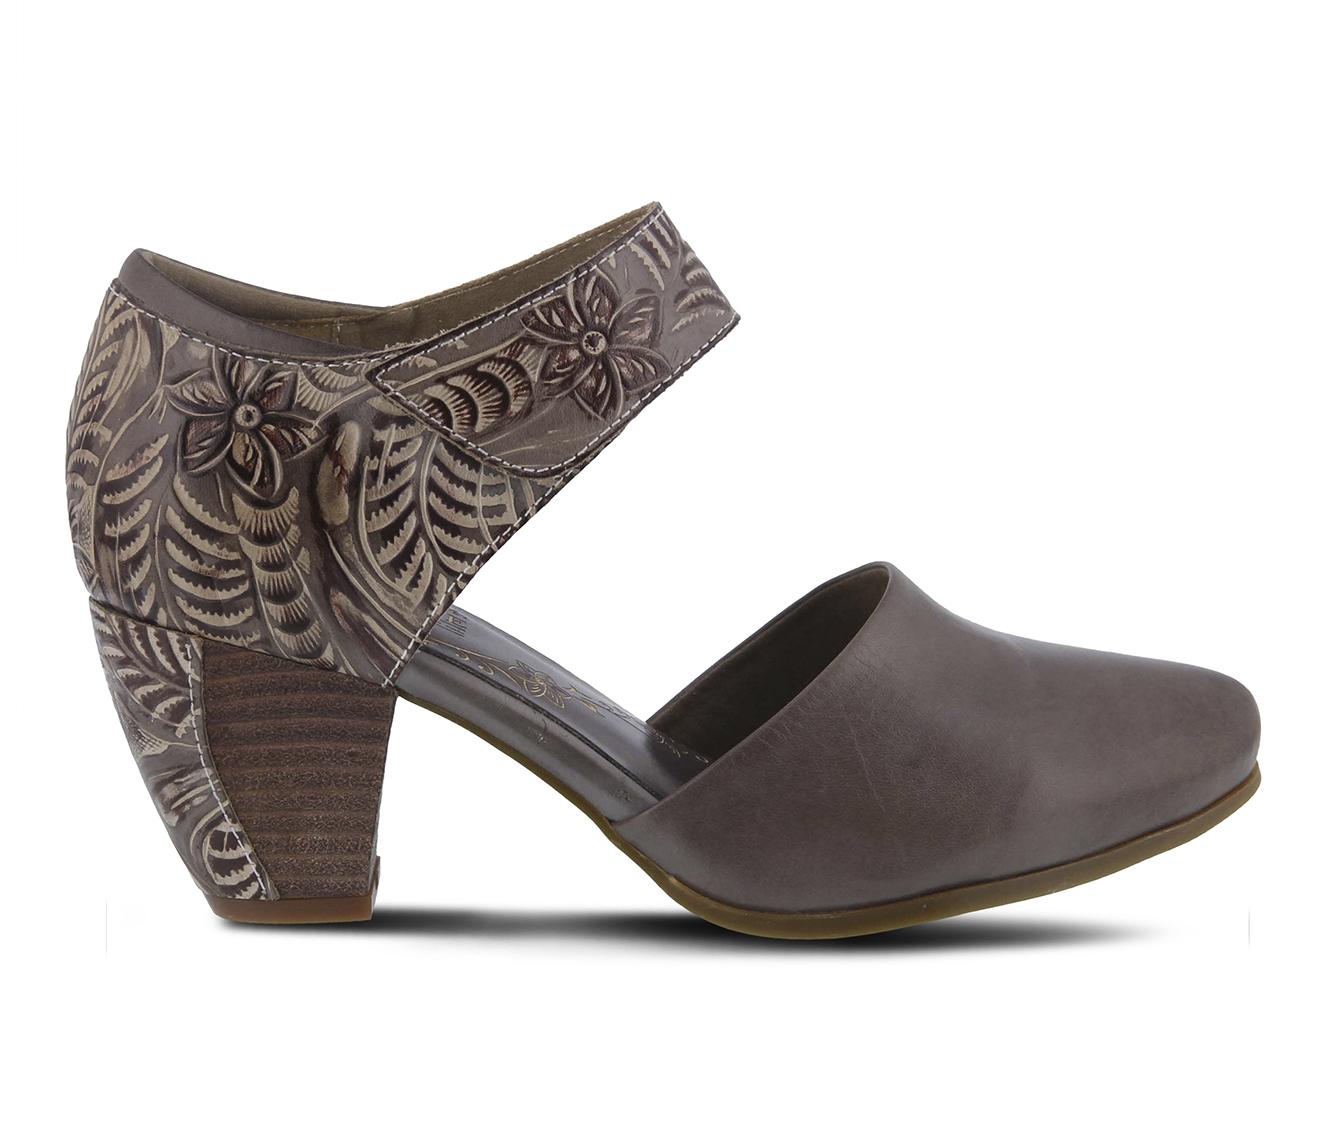 L'Artiste Toolie Women's Dress Shoe (Gray Leather)